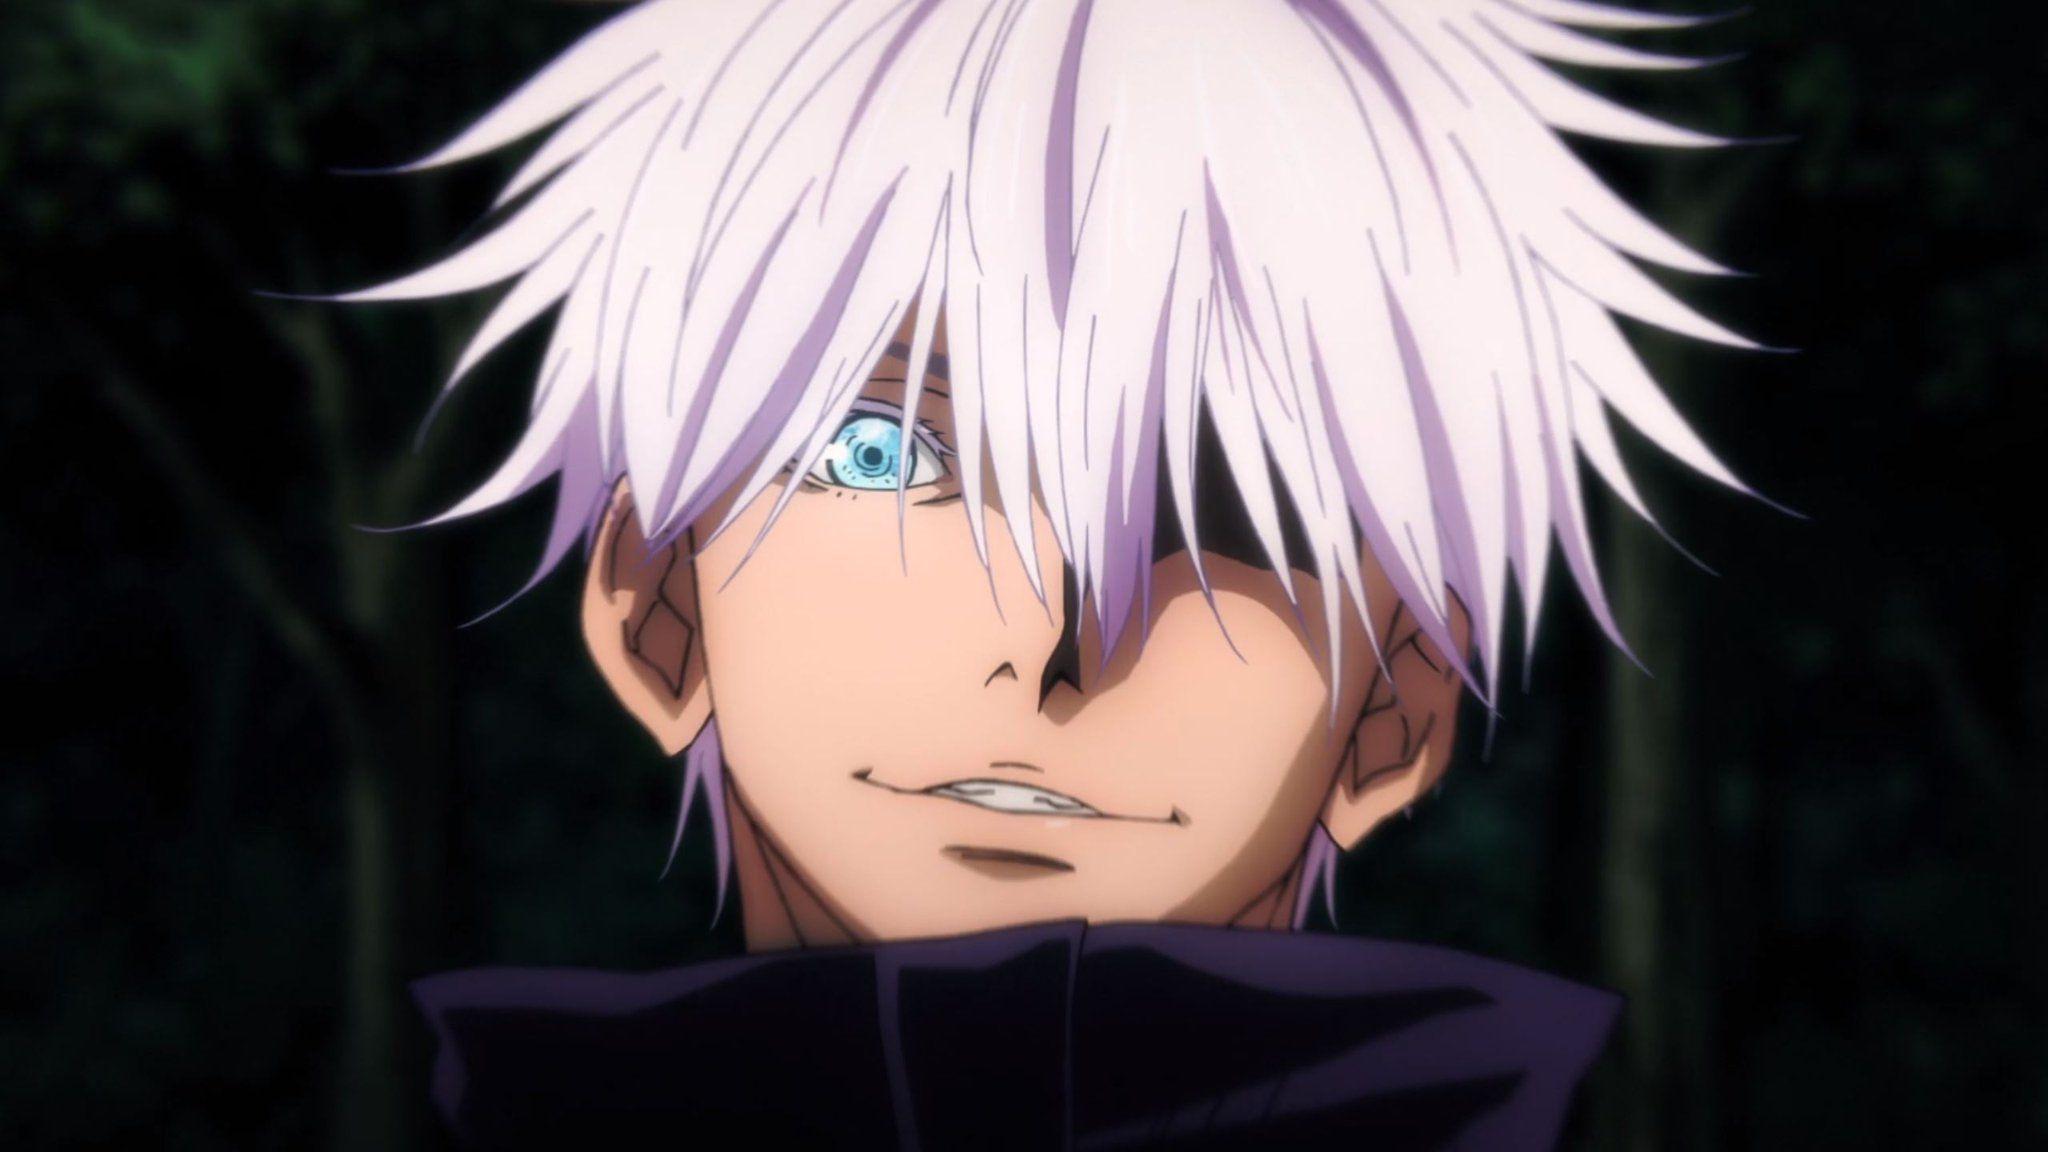 Imagens De Animes On Twitter In 2021 Jujutsu Anime Anime Villians